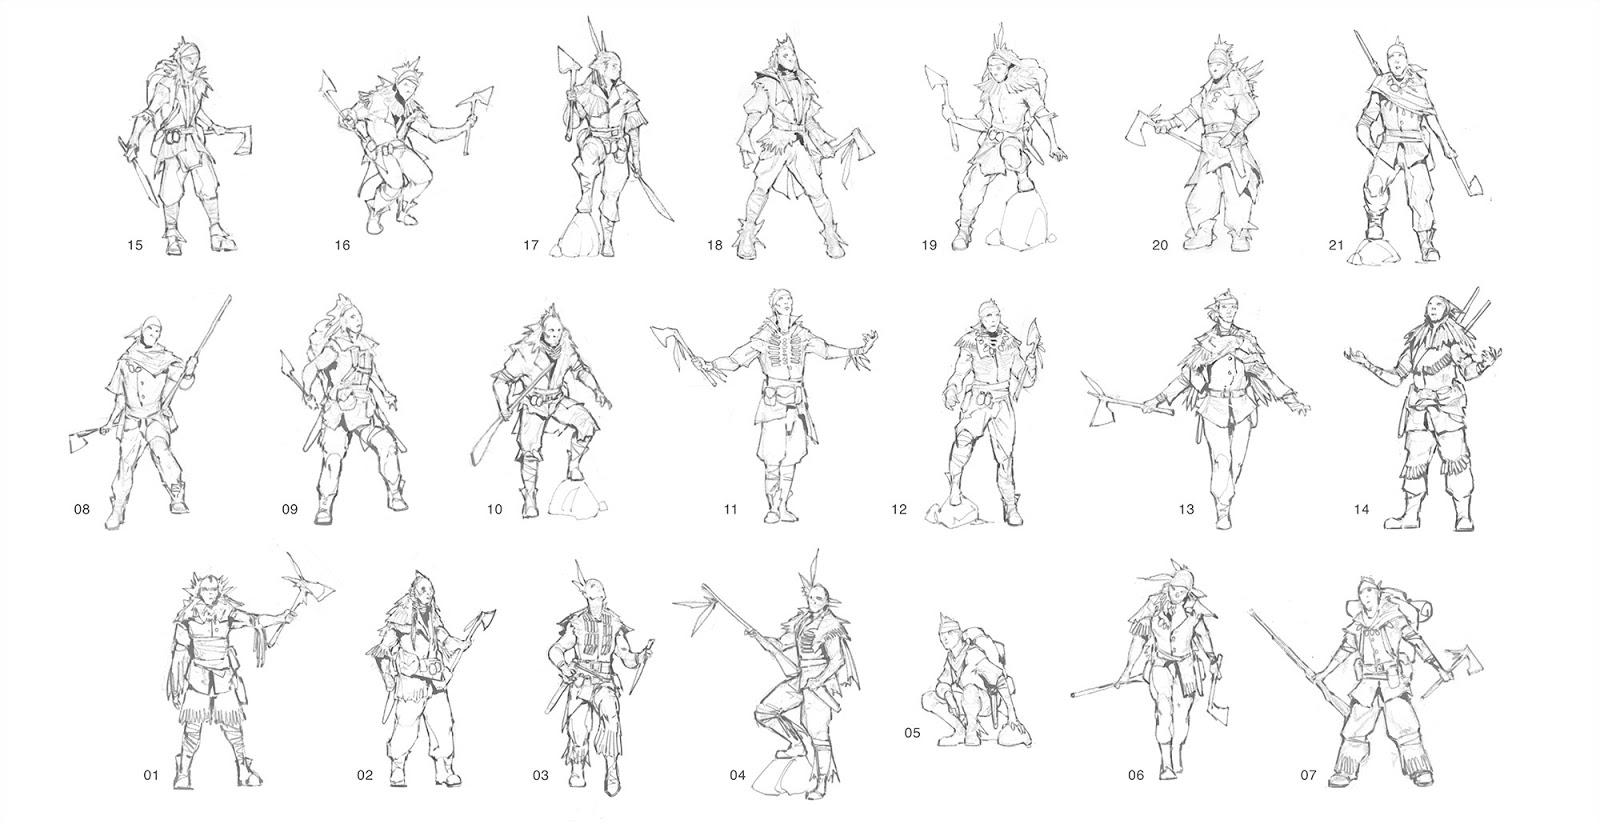 manga character template - bk studio